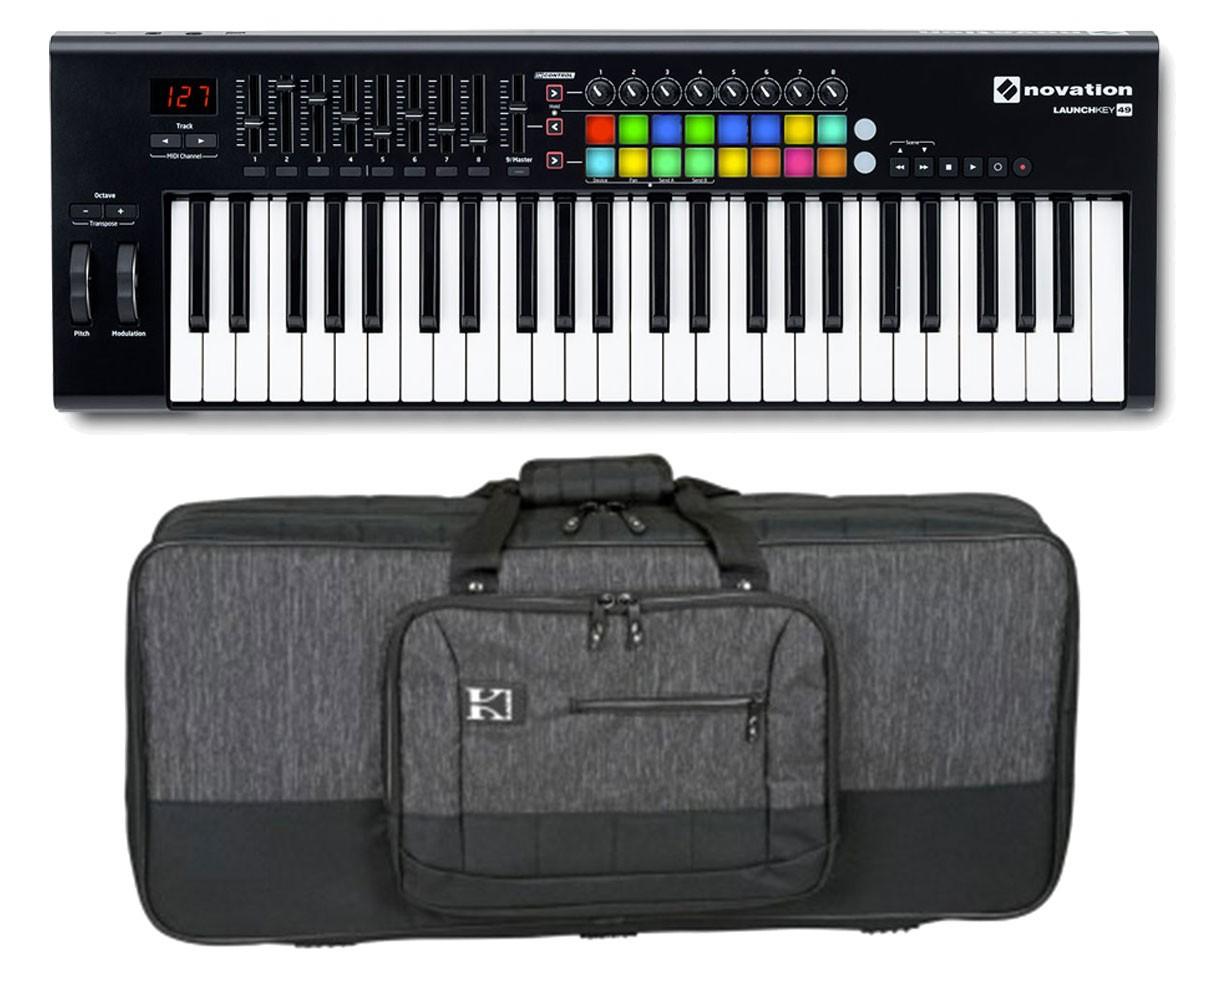 Novation Launchkey 49-Key MIDI Controller + Bag